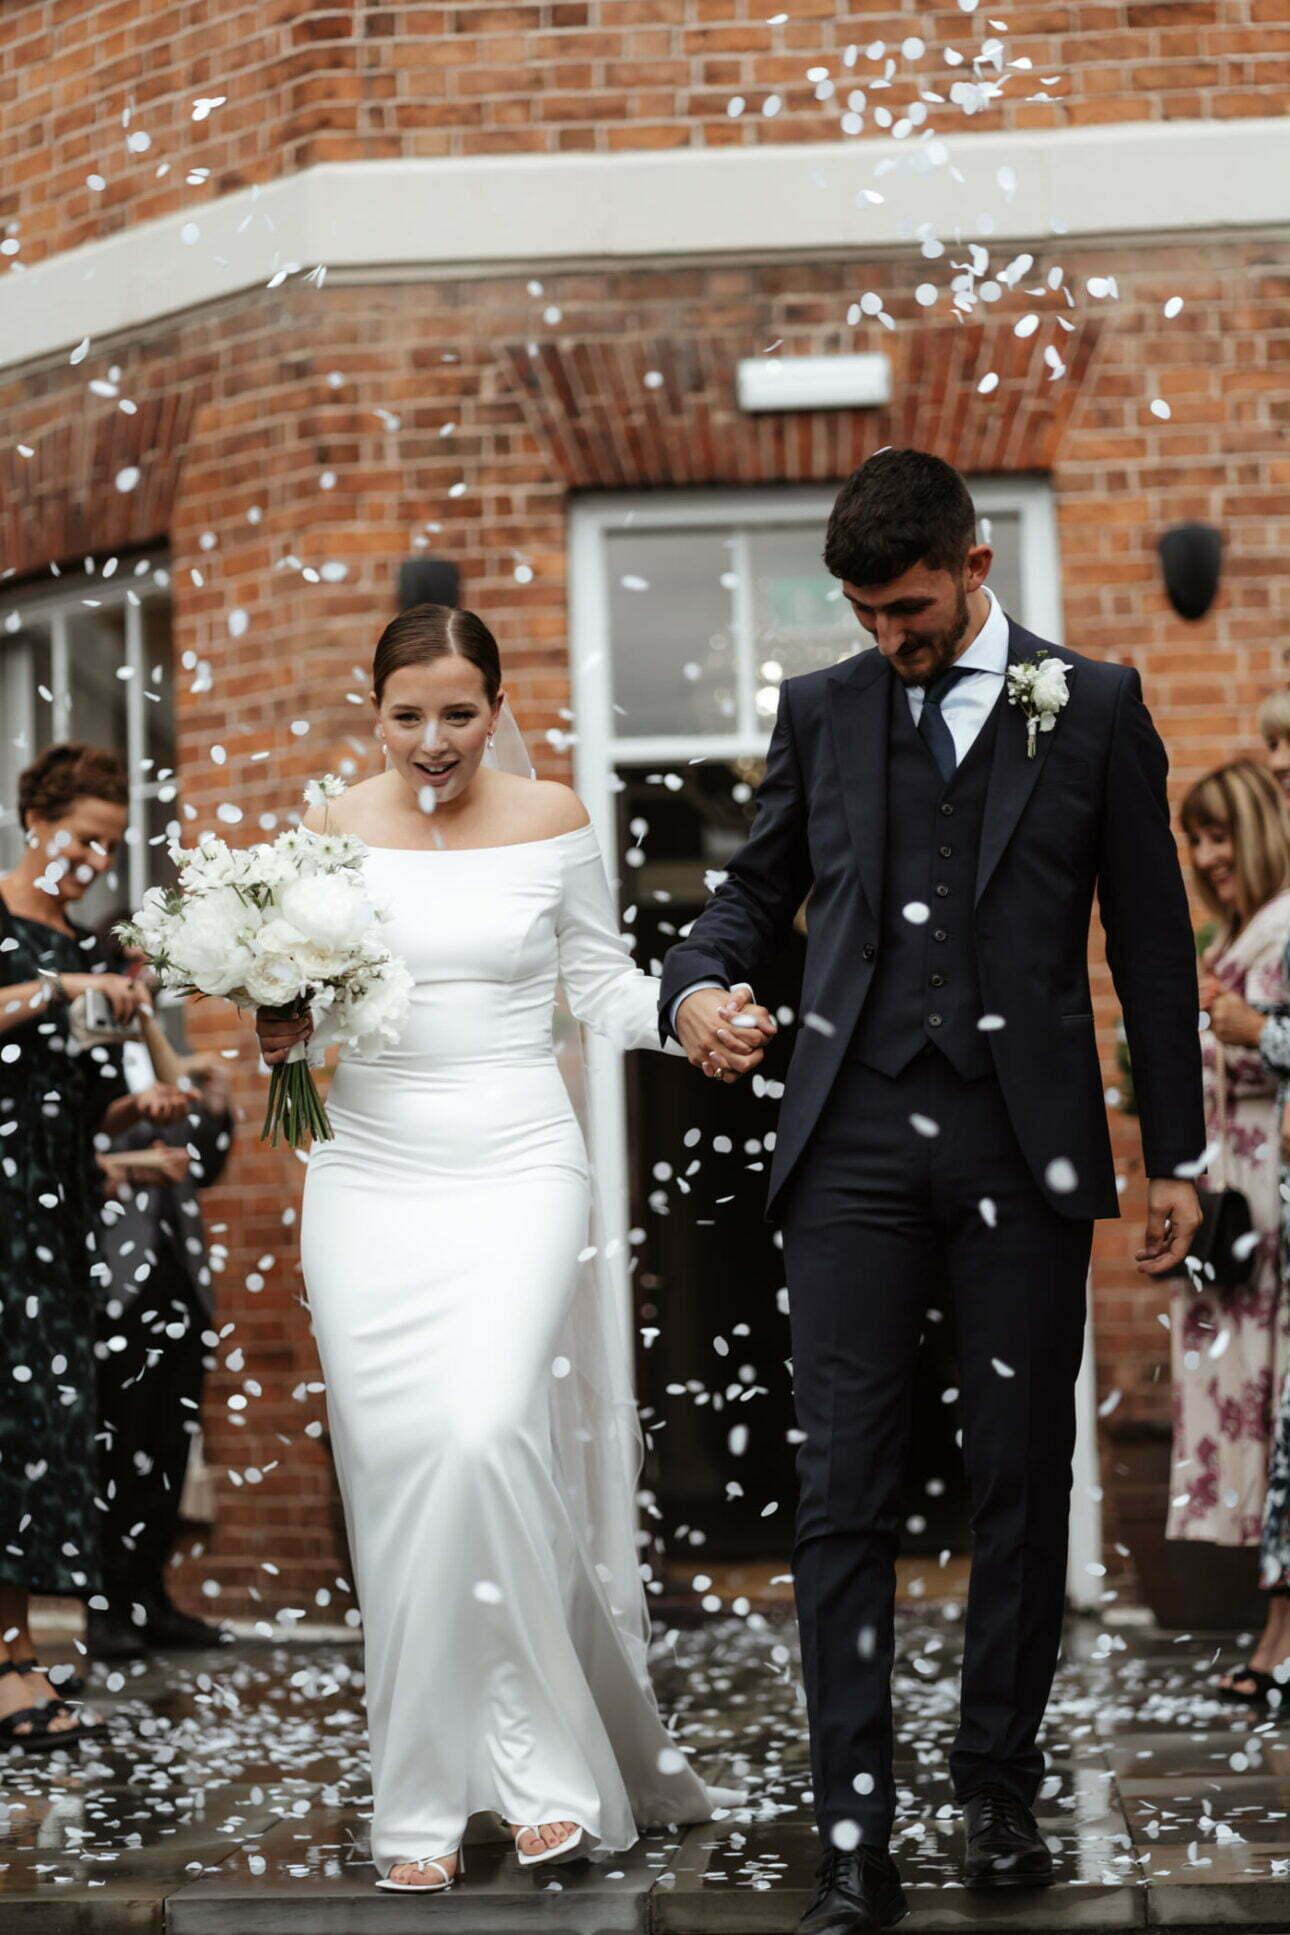 Happy couple walking through confetti